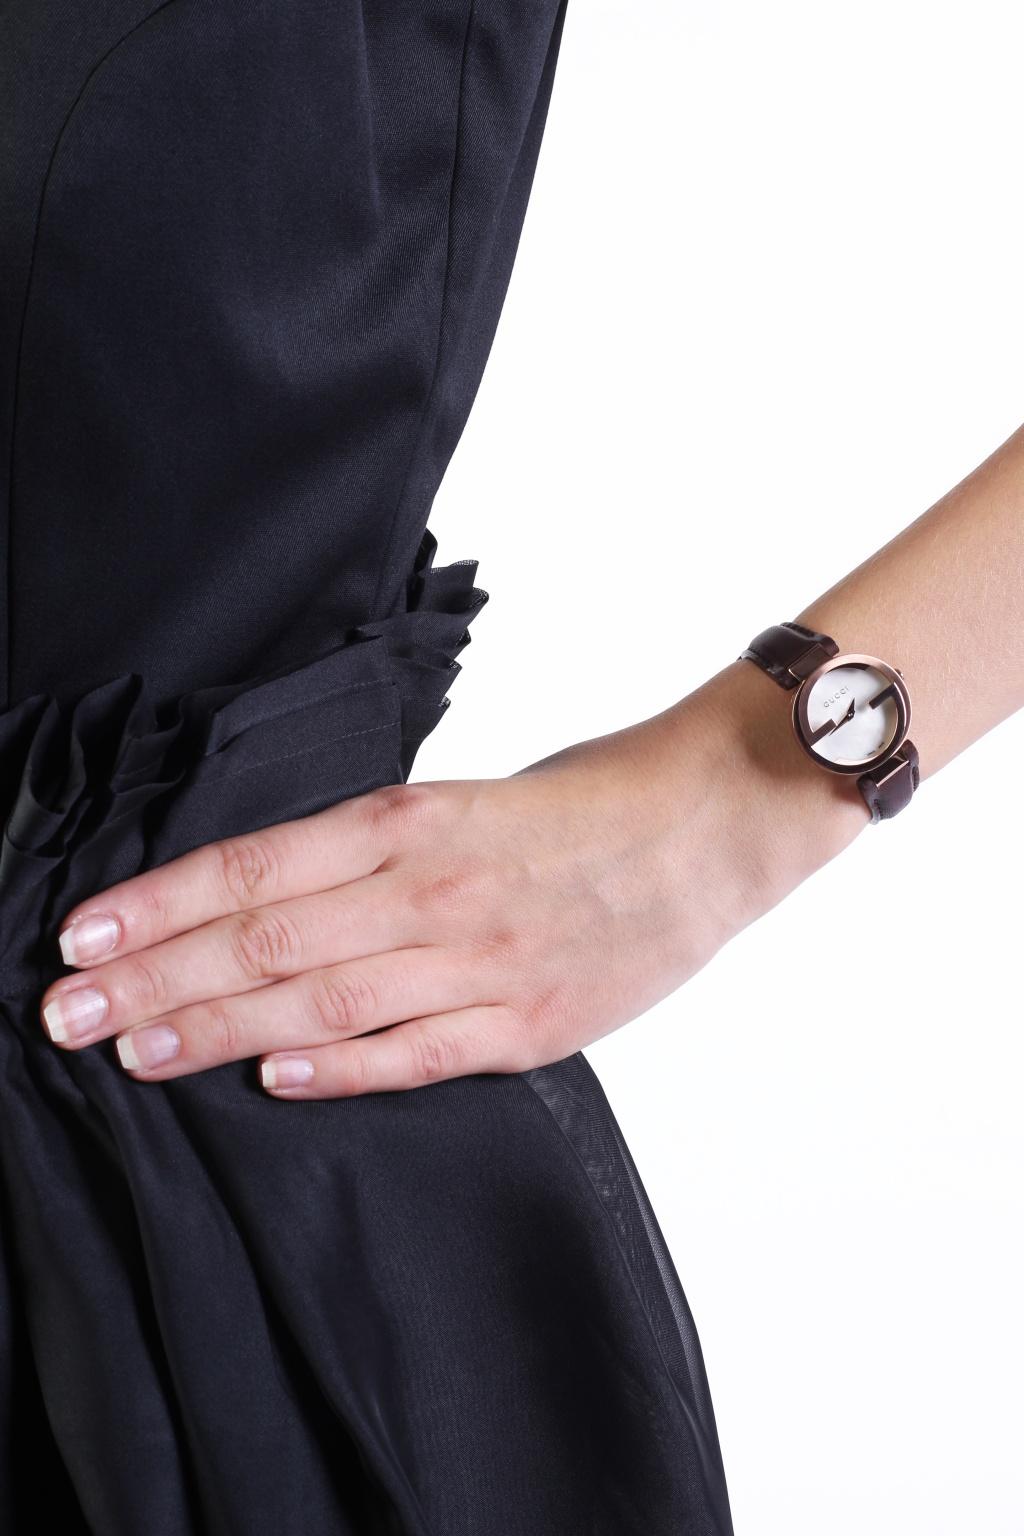 Gucci 'Interlocking' watch on leather strap